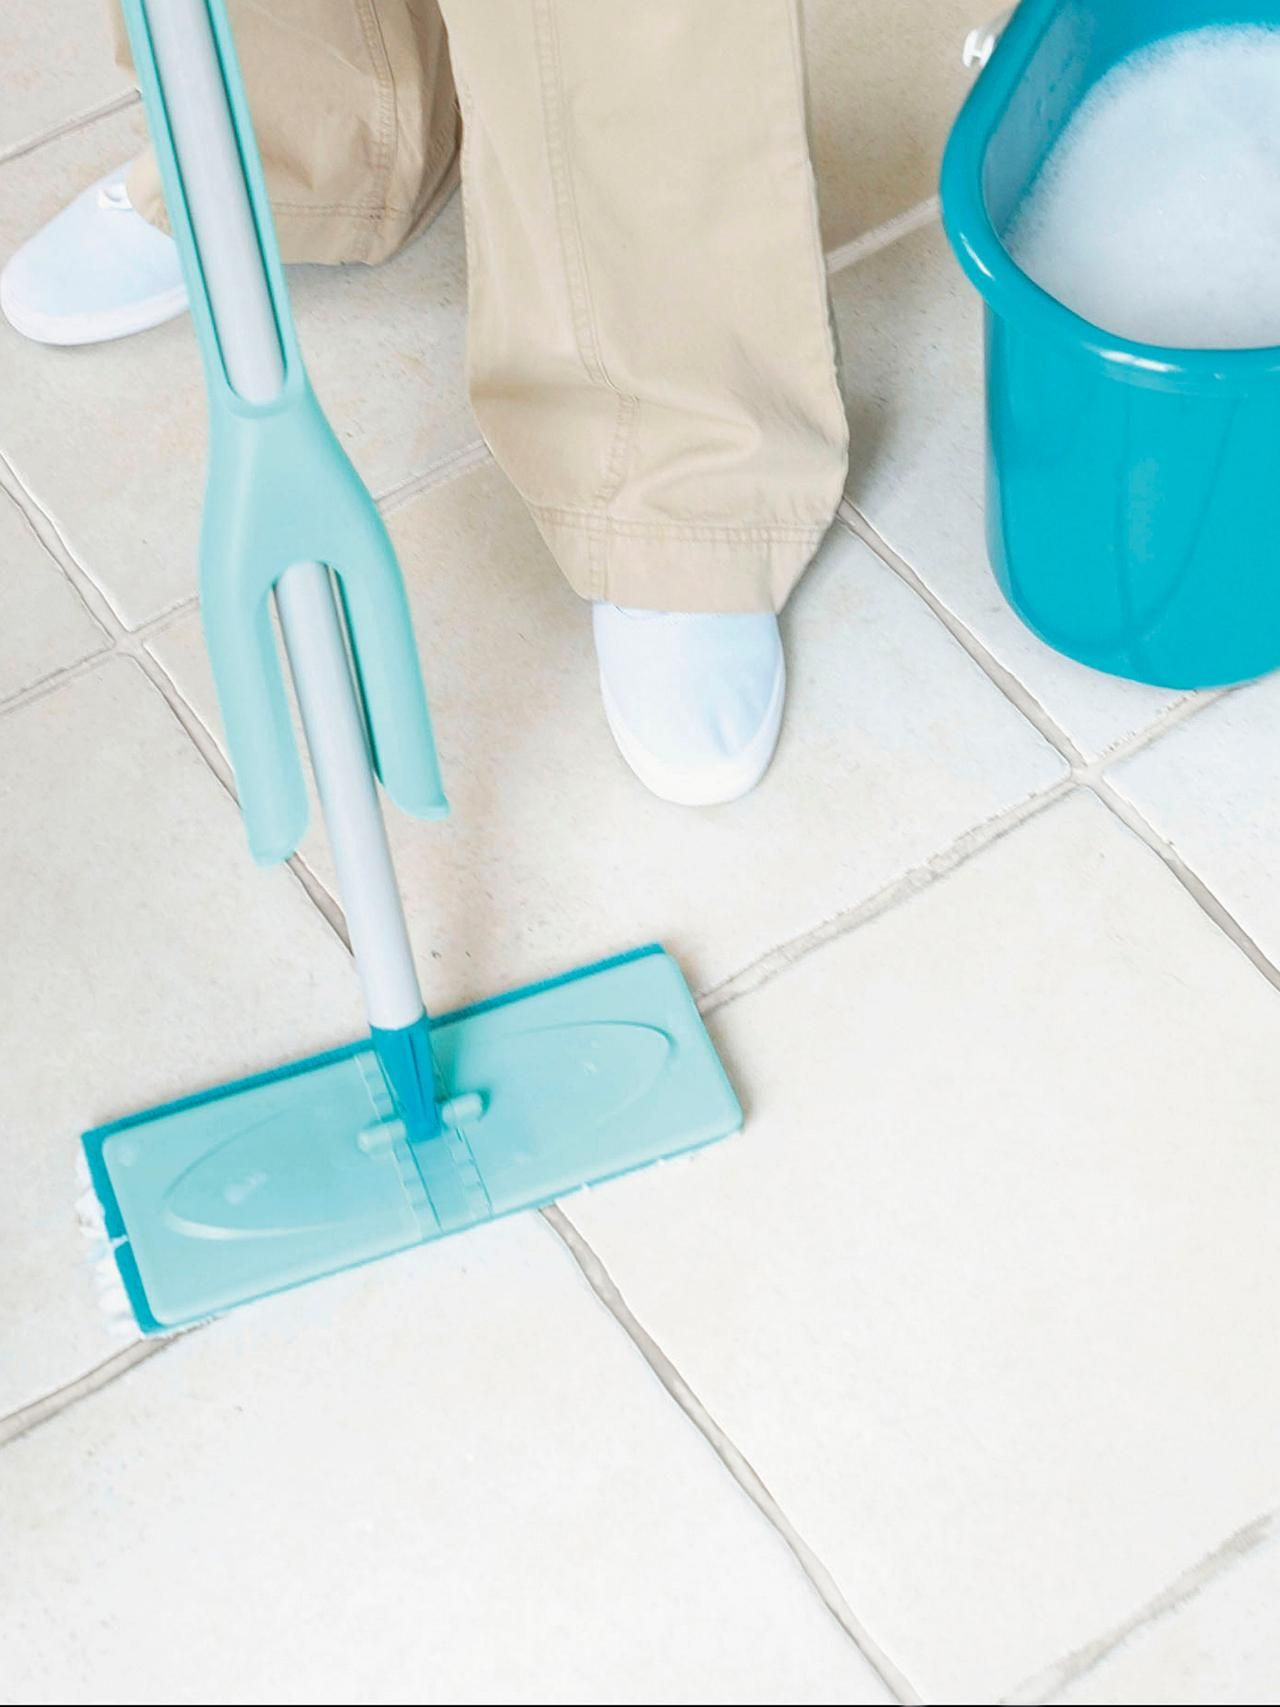 Cleaning ceramic tile floors beautiful pastel blue mopping tools cleaning ceramic tile floors beautiful pastel blue mopping tools mopping water bucket dailygadgetfo Images